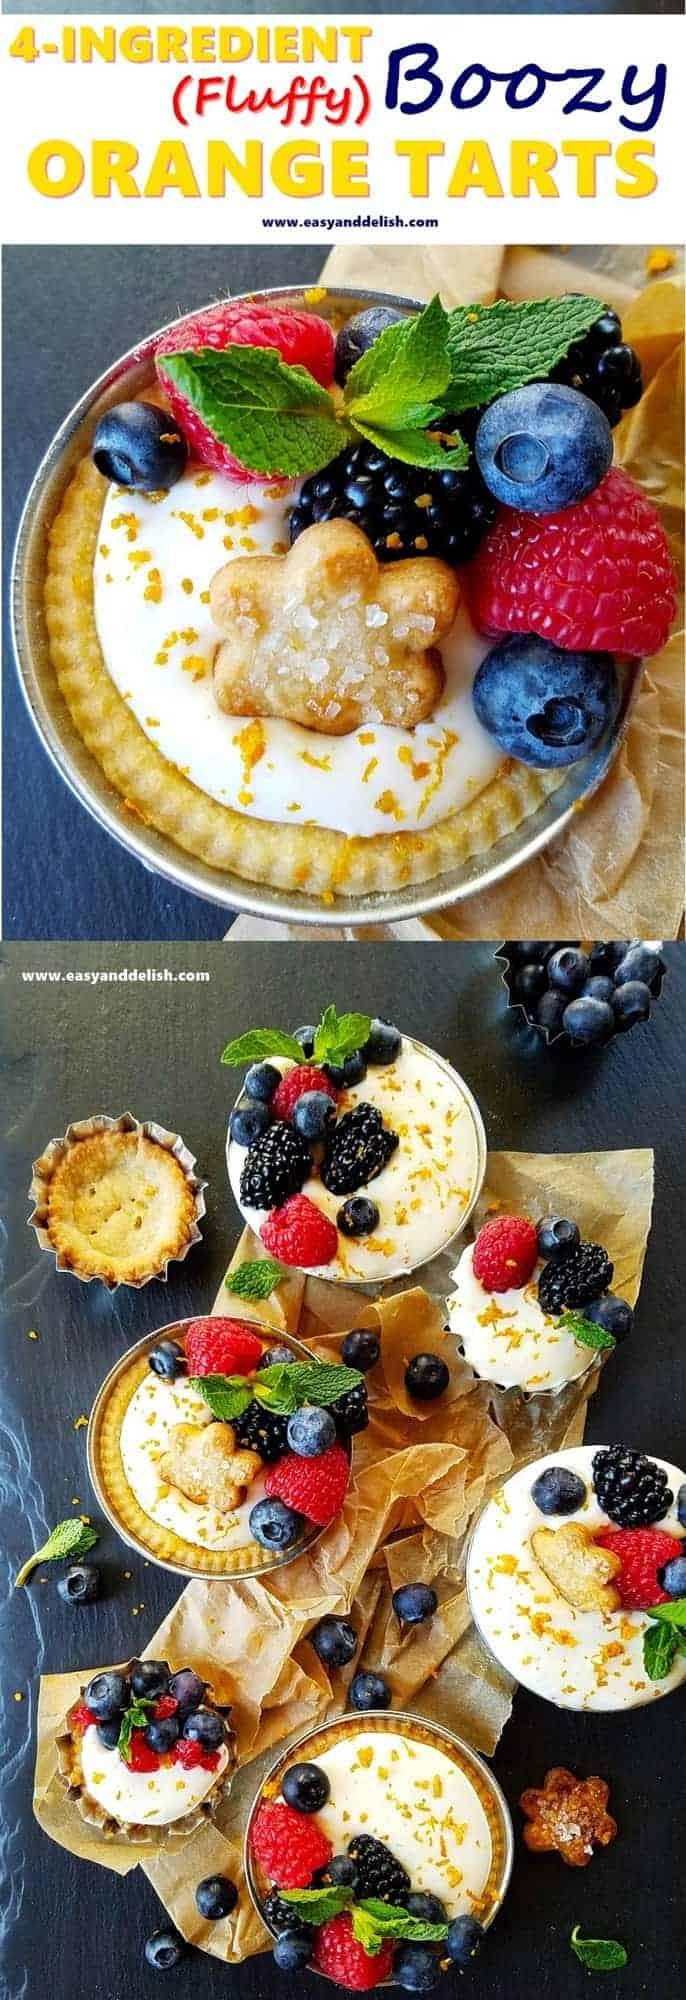 collage of orange tarts